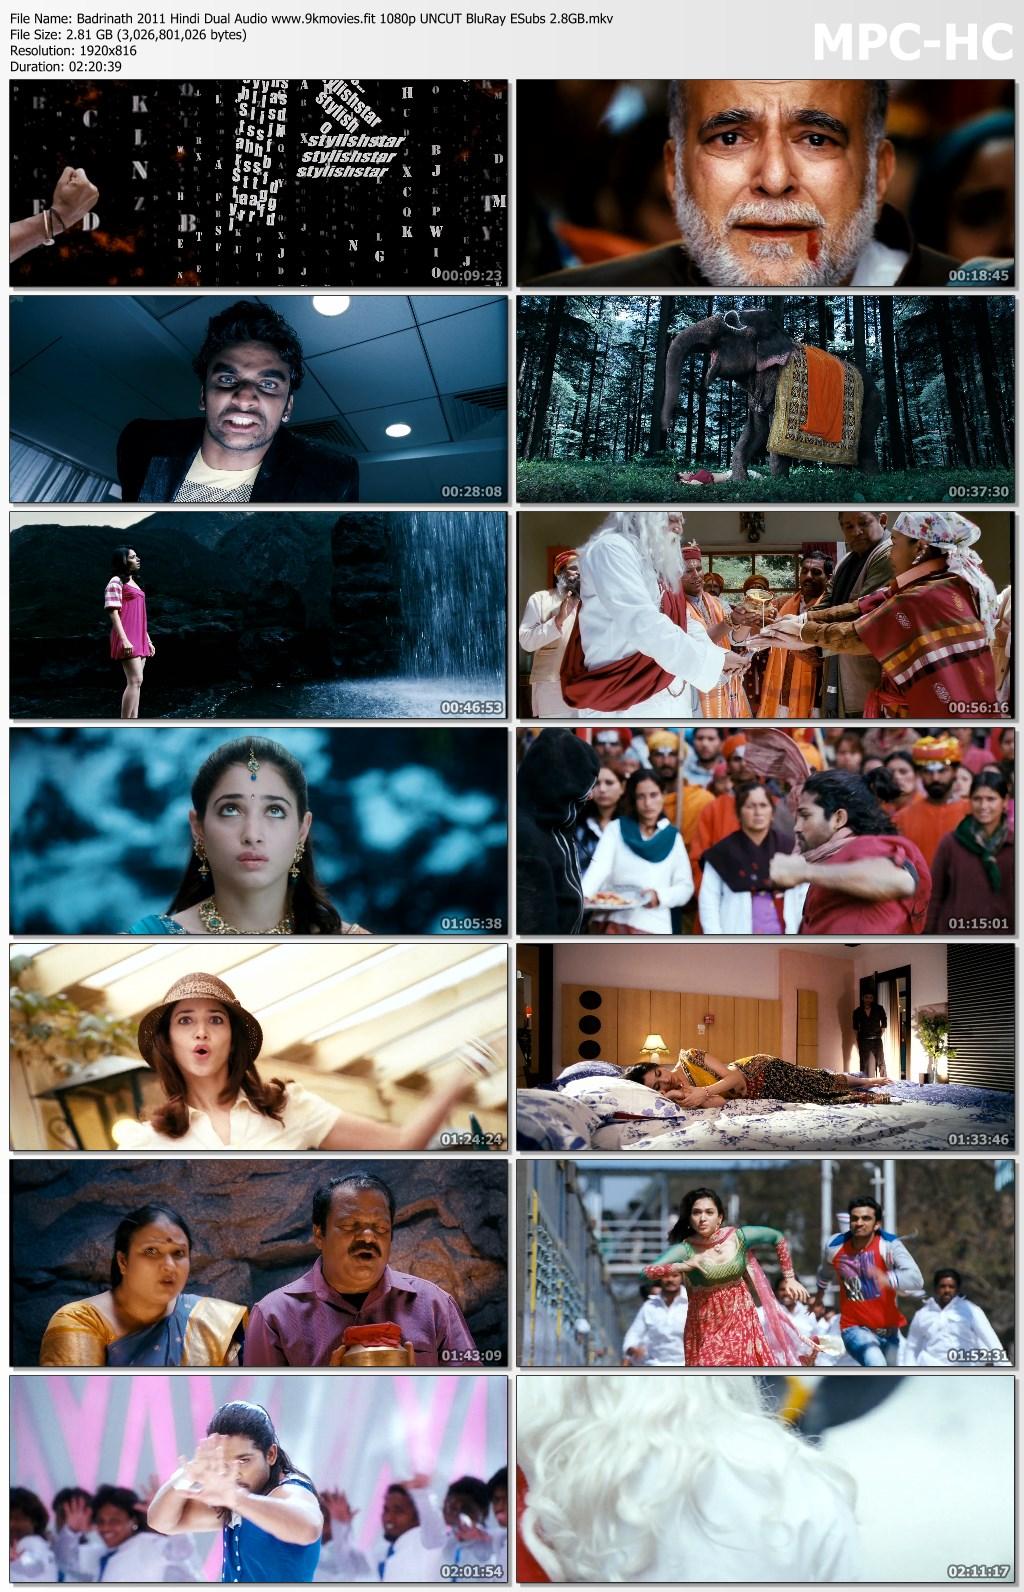 Pyaar Ka Punchnama 2 Movie Dual Audio 720p Download [NEW] Badrinath-2011-Hindi-Dual-Audio-www.9kmovies.fit-1080p-UNCUT-BluRay-ESubs-2.8GB.mkv_thumbs